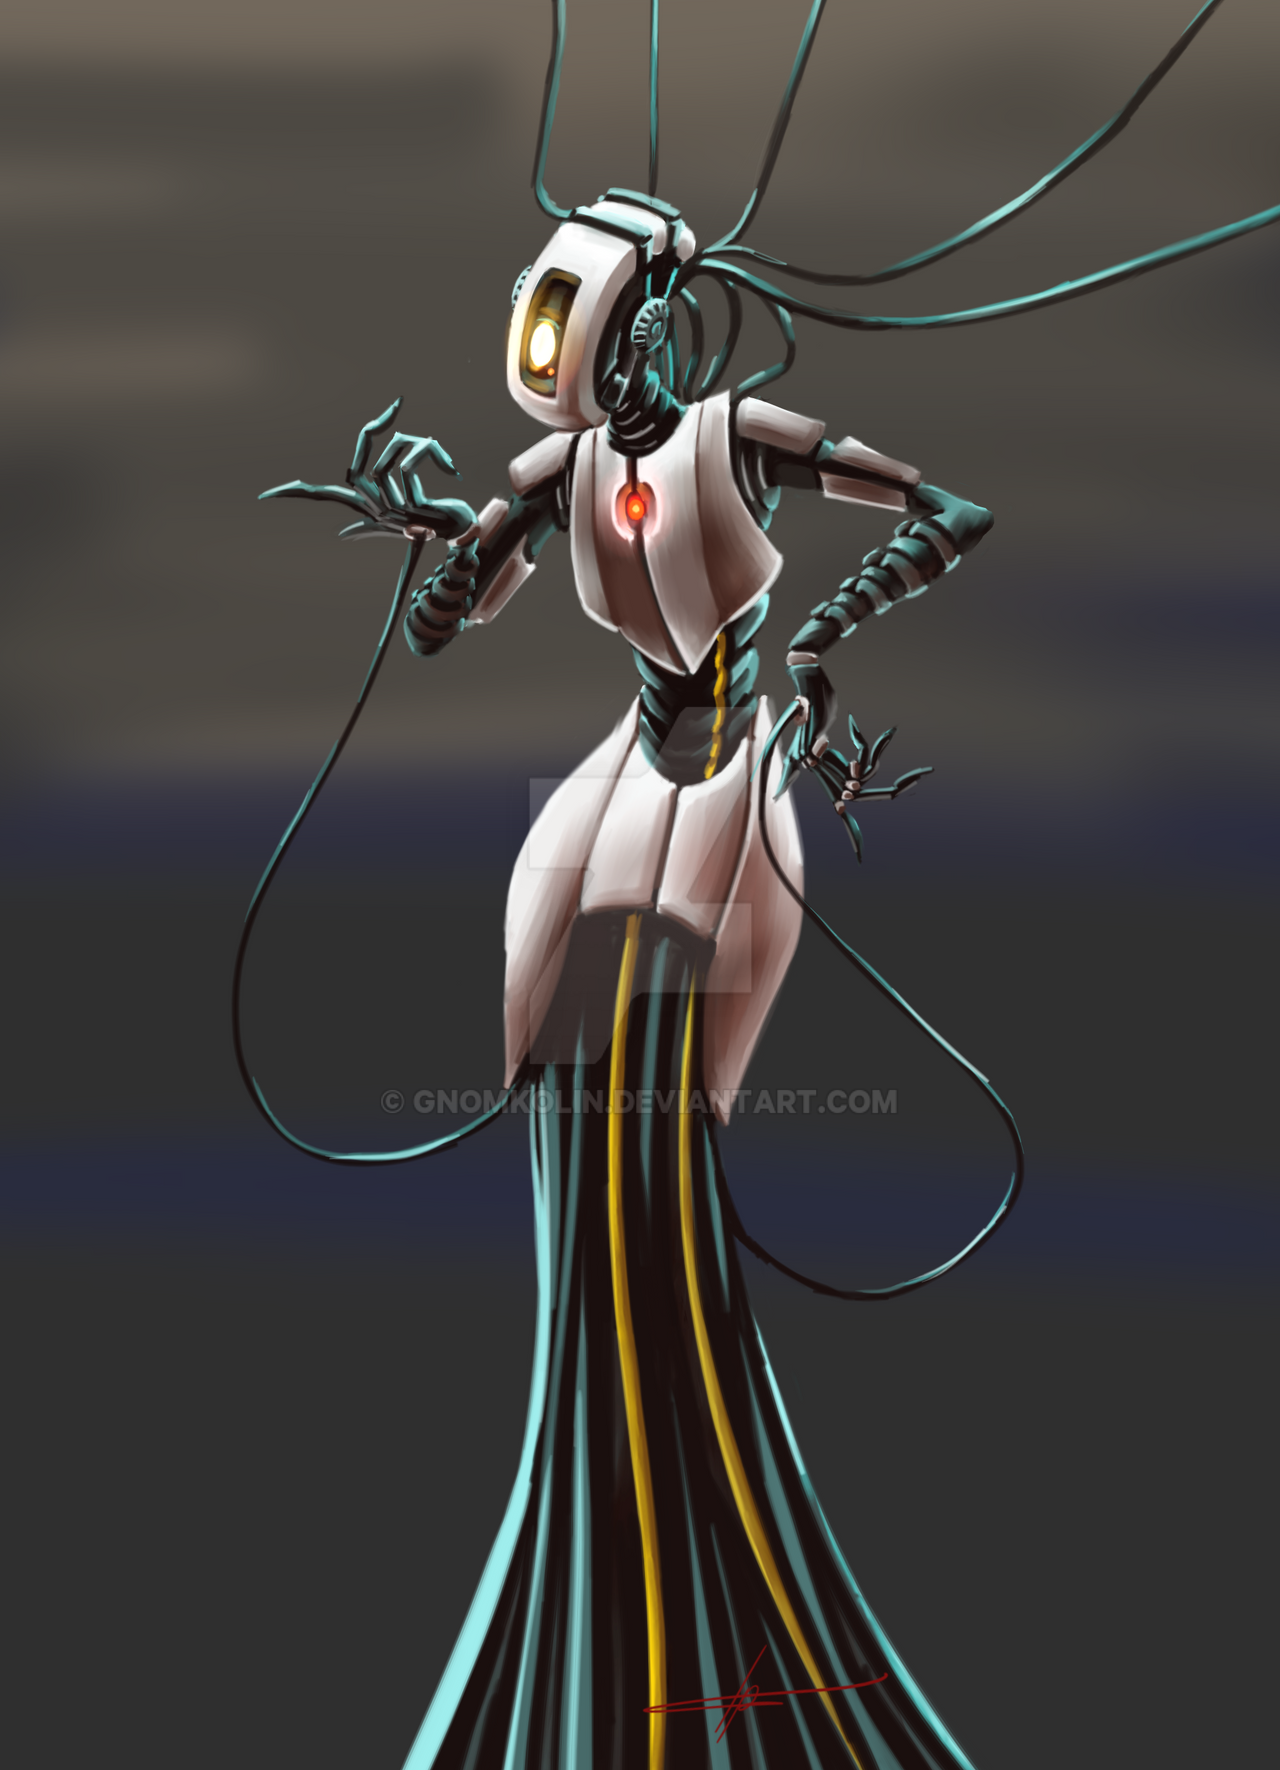 Glados costume concept by gnomKOLIN